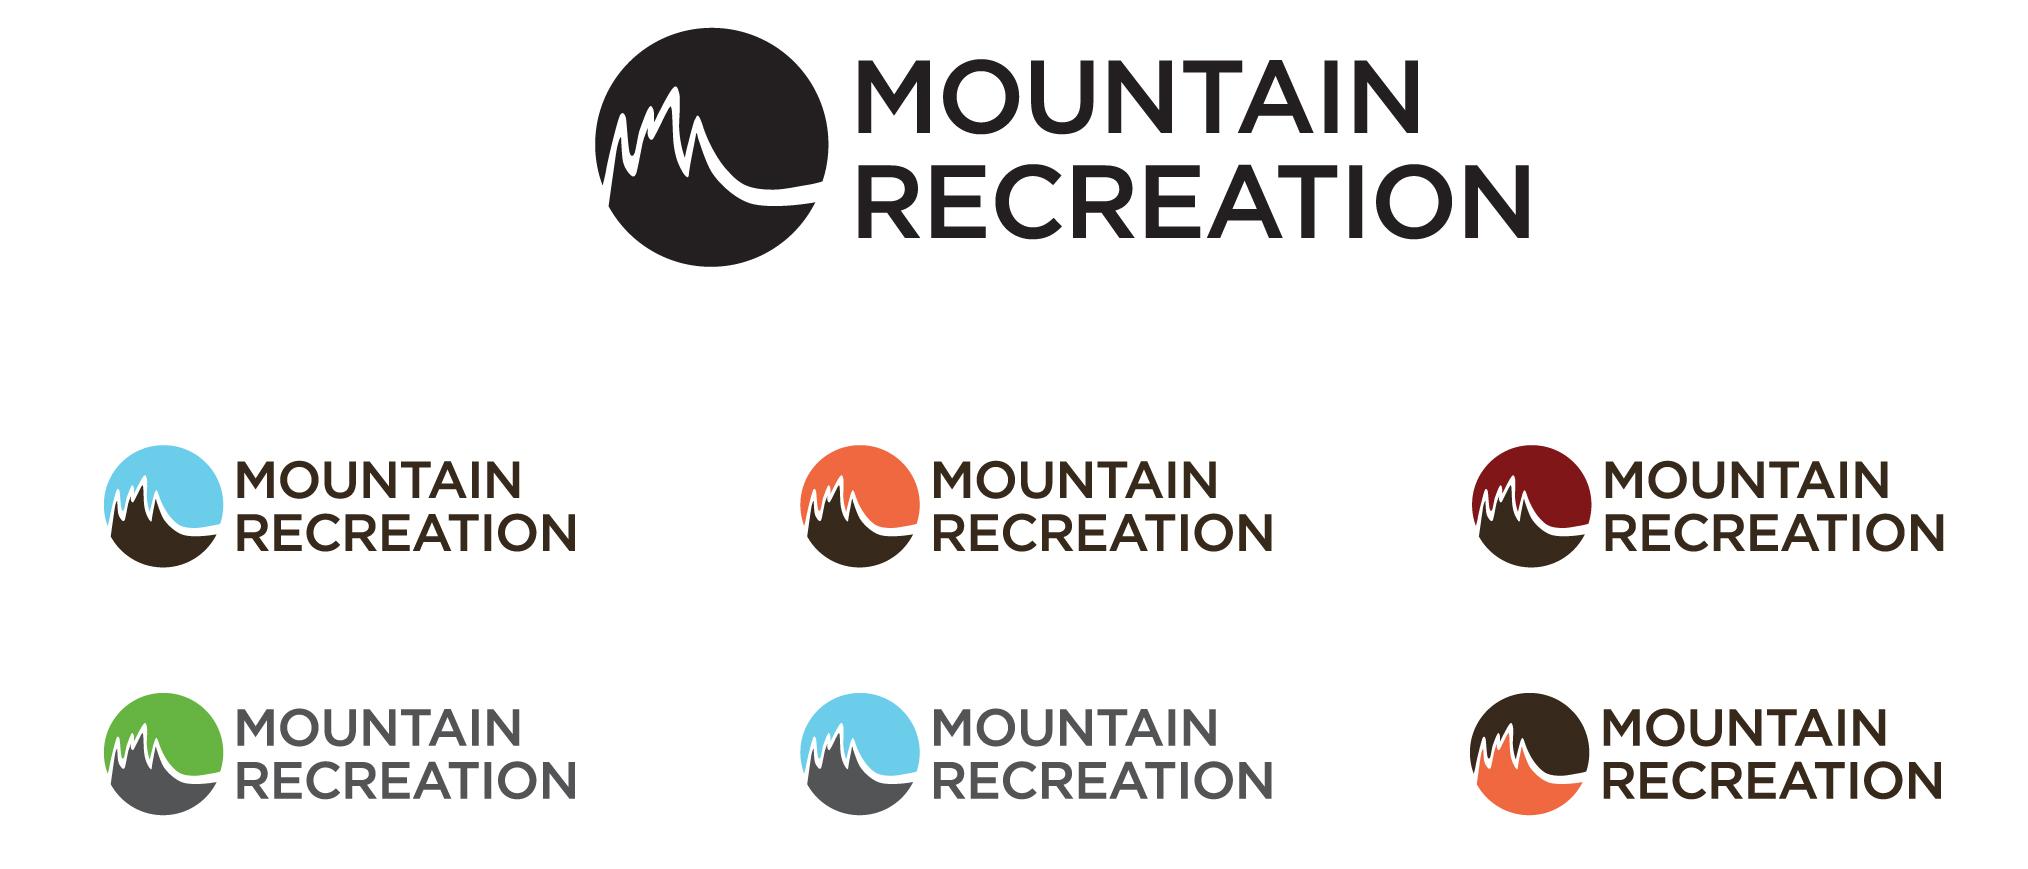 mountain recreation logo download page mountain recreation